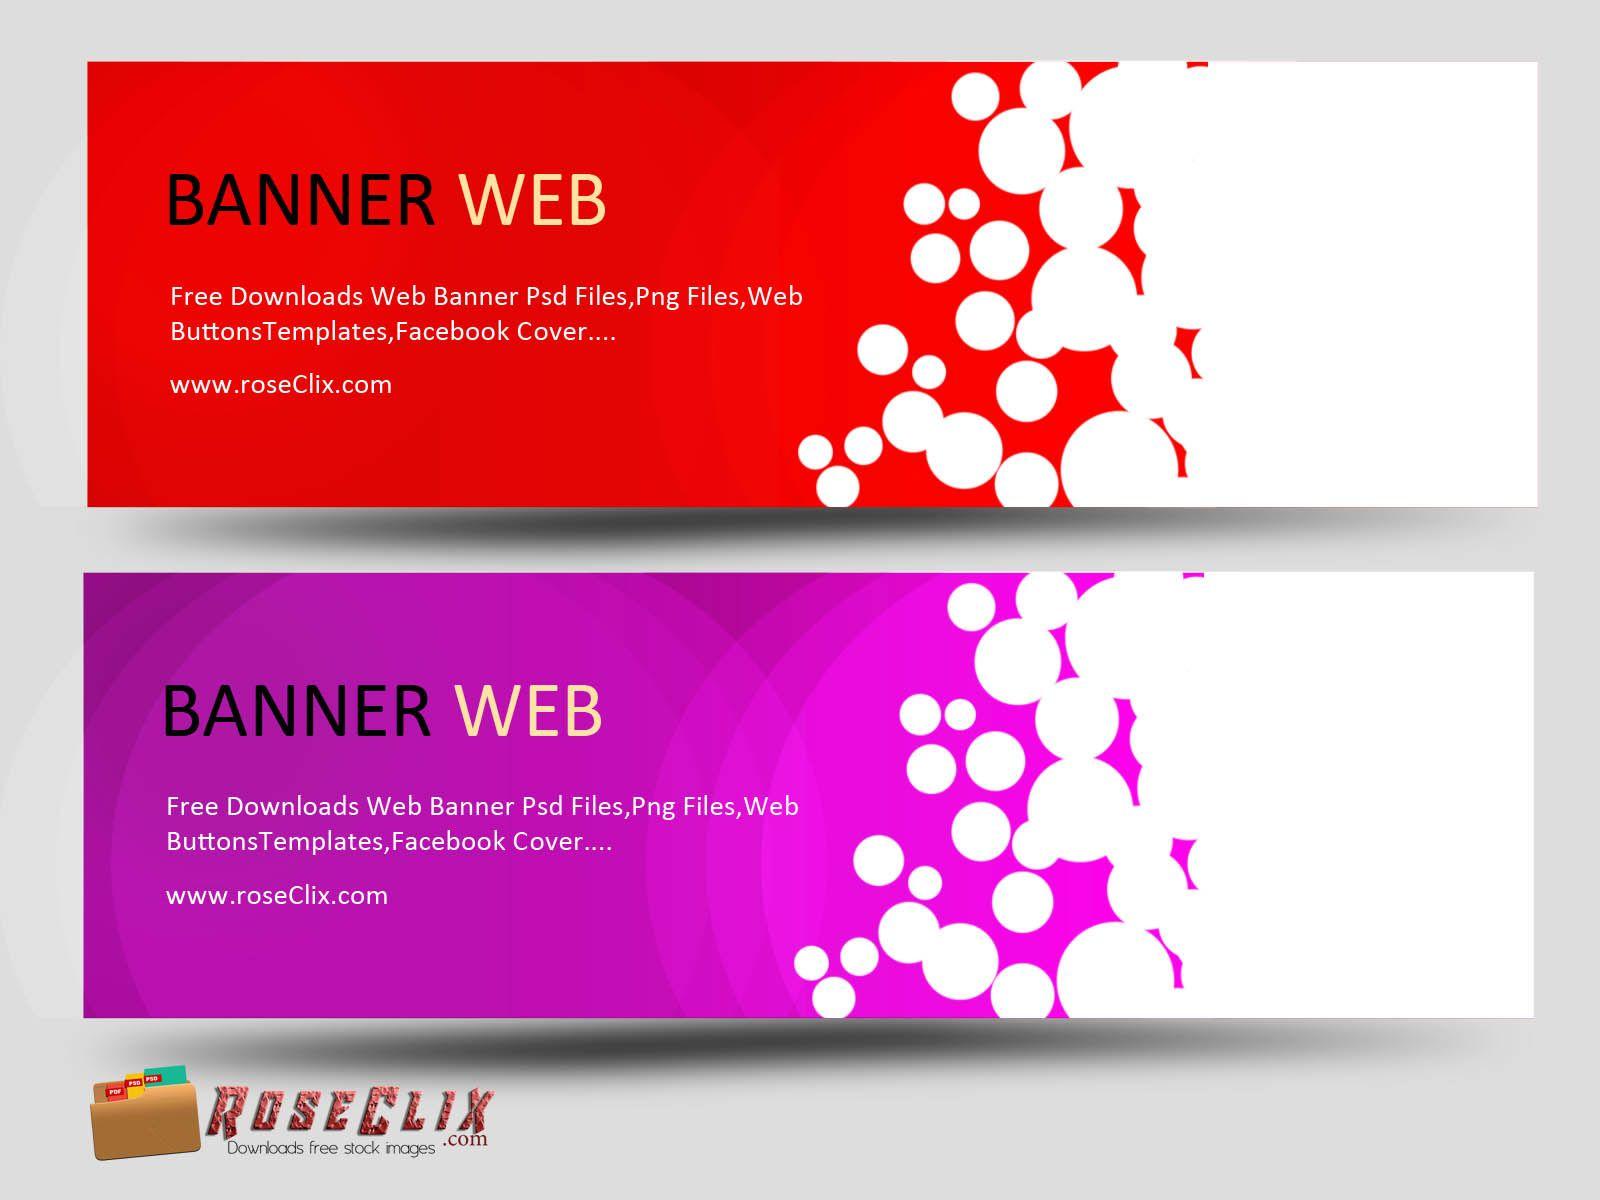 Free Stock Photo Fb Cover Web Design Templates Png Files Psd Files Mug Templates Web Buttons Psd Stock Resources Konturnye Risunki Risunki